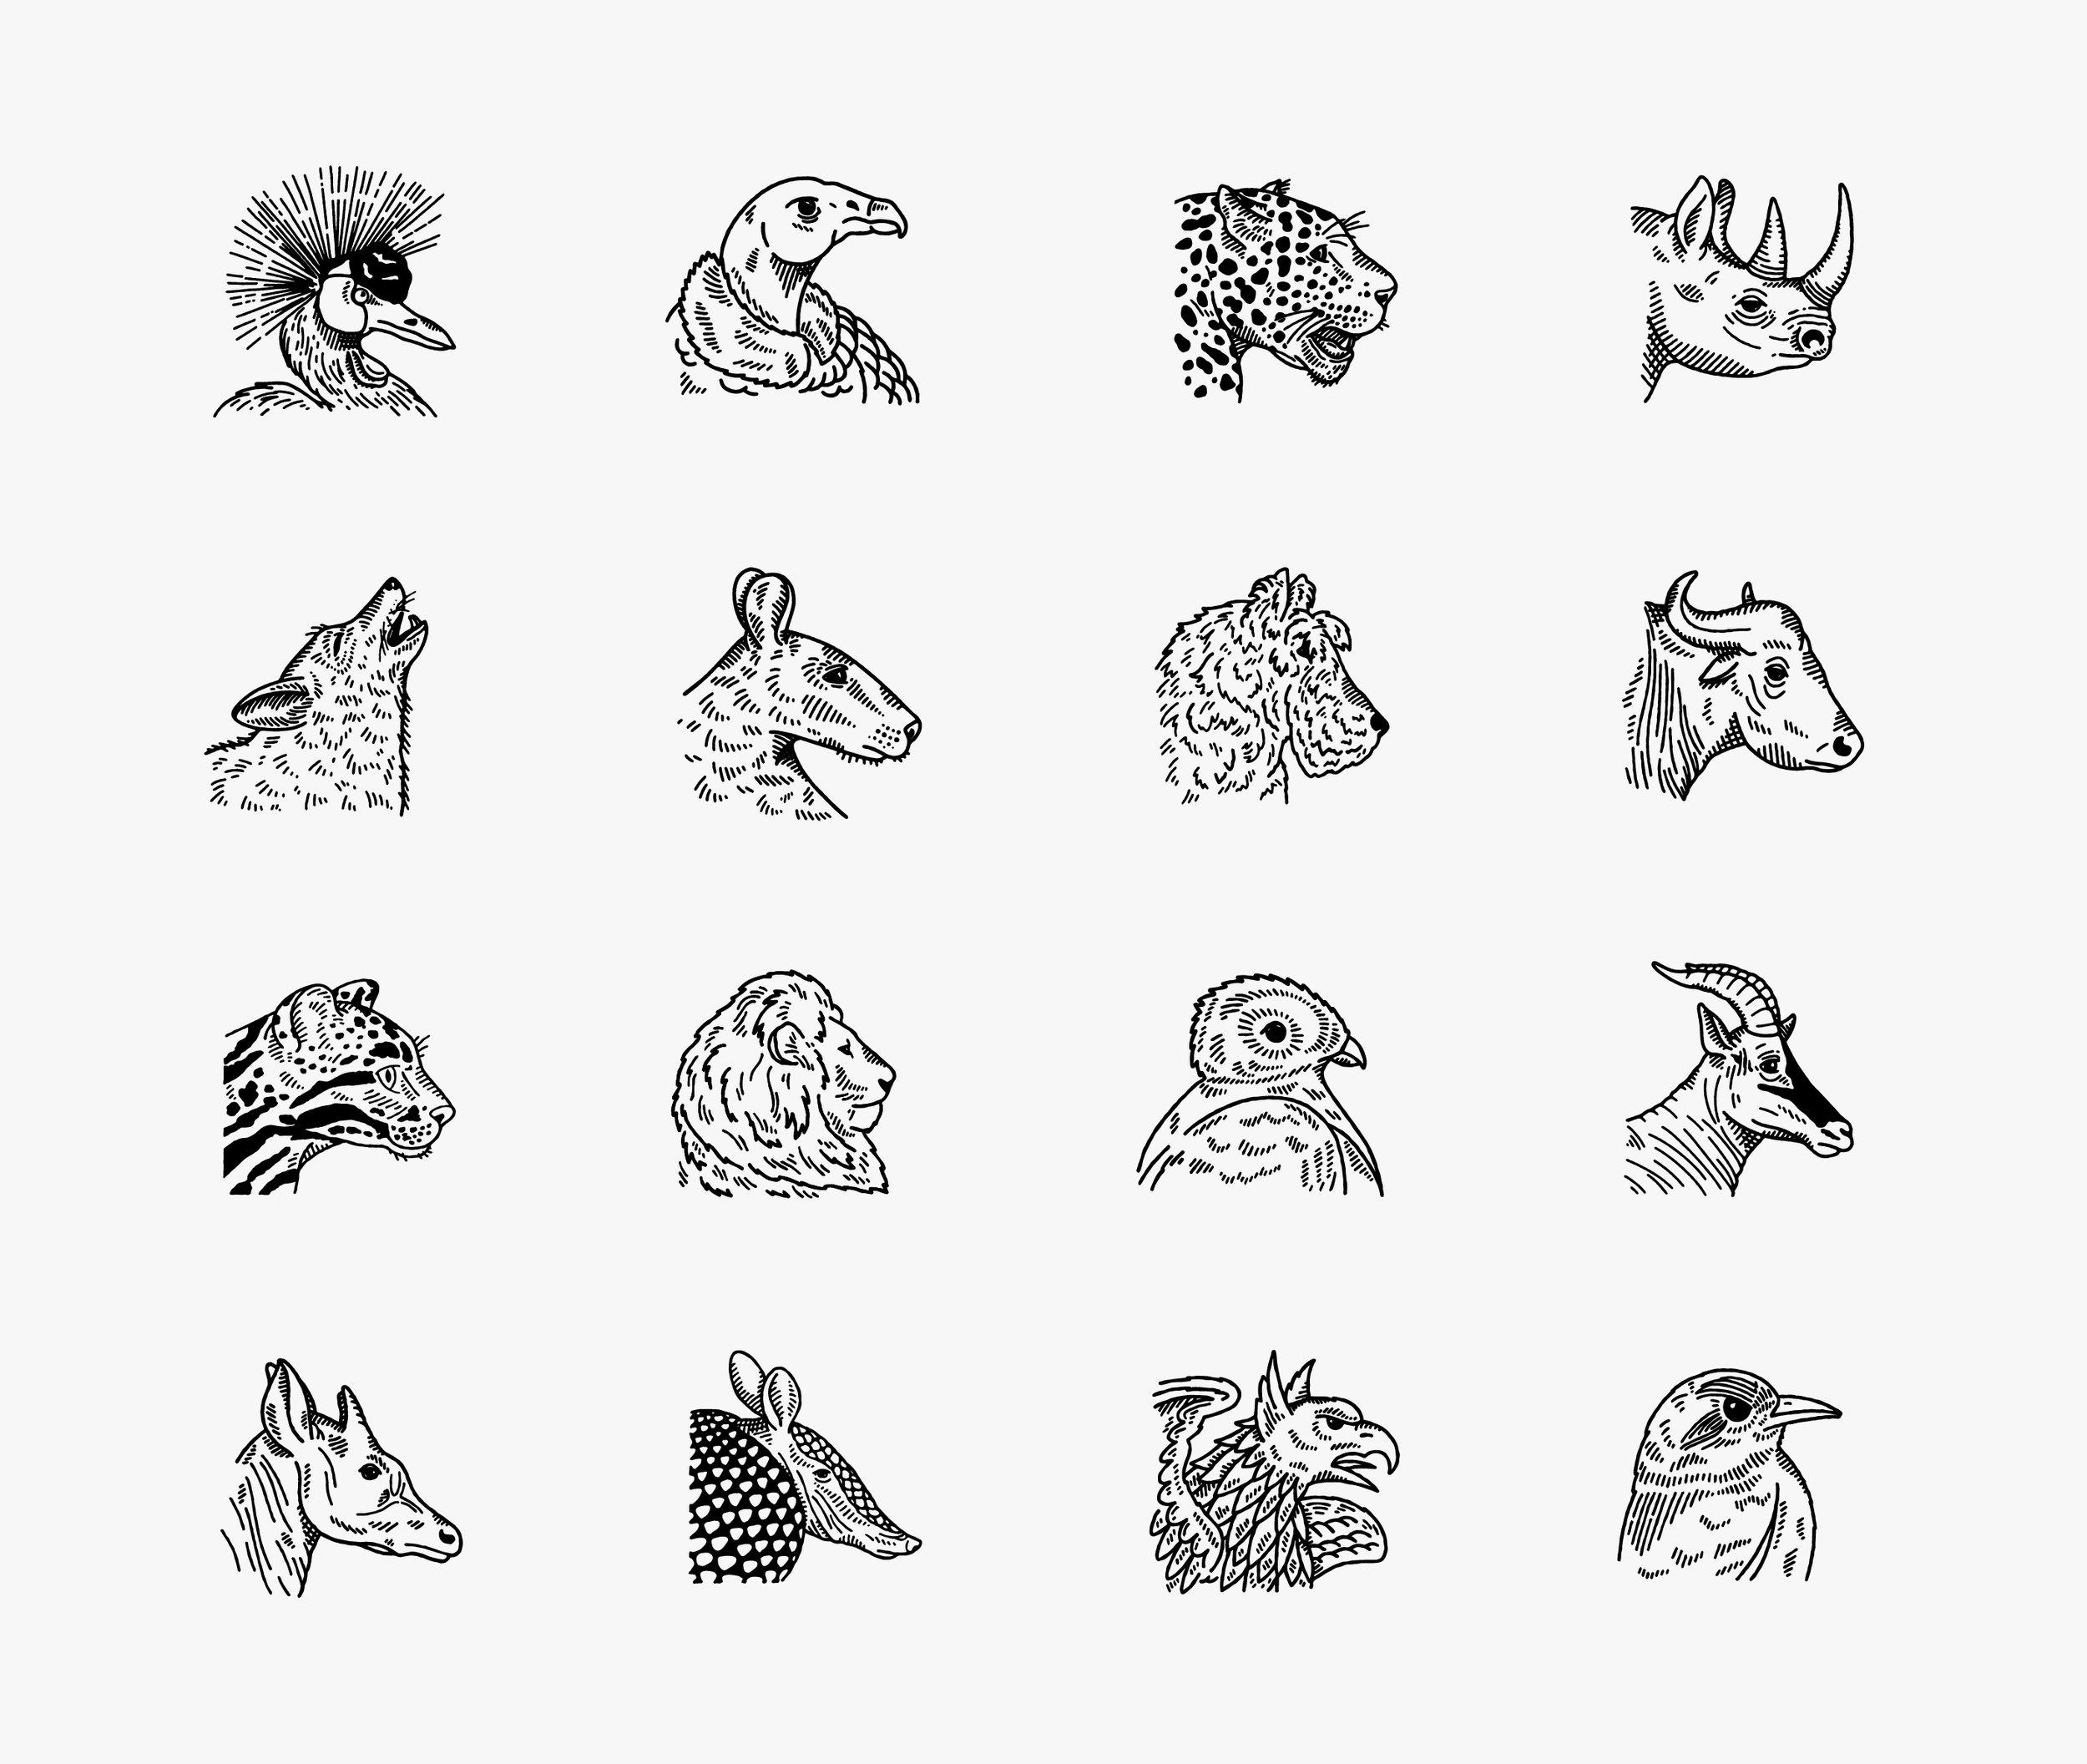 Studio Freight - Roosevelt Coffee Animal Illustrations